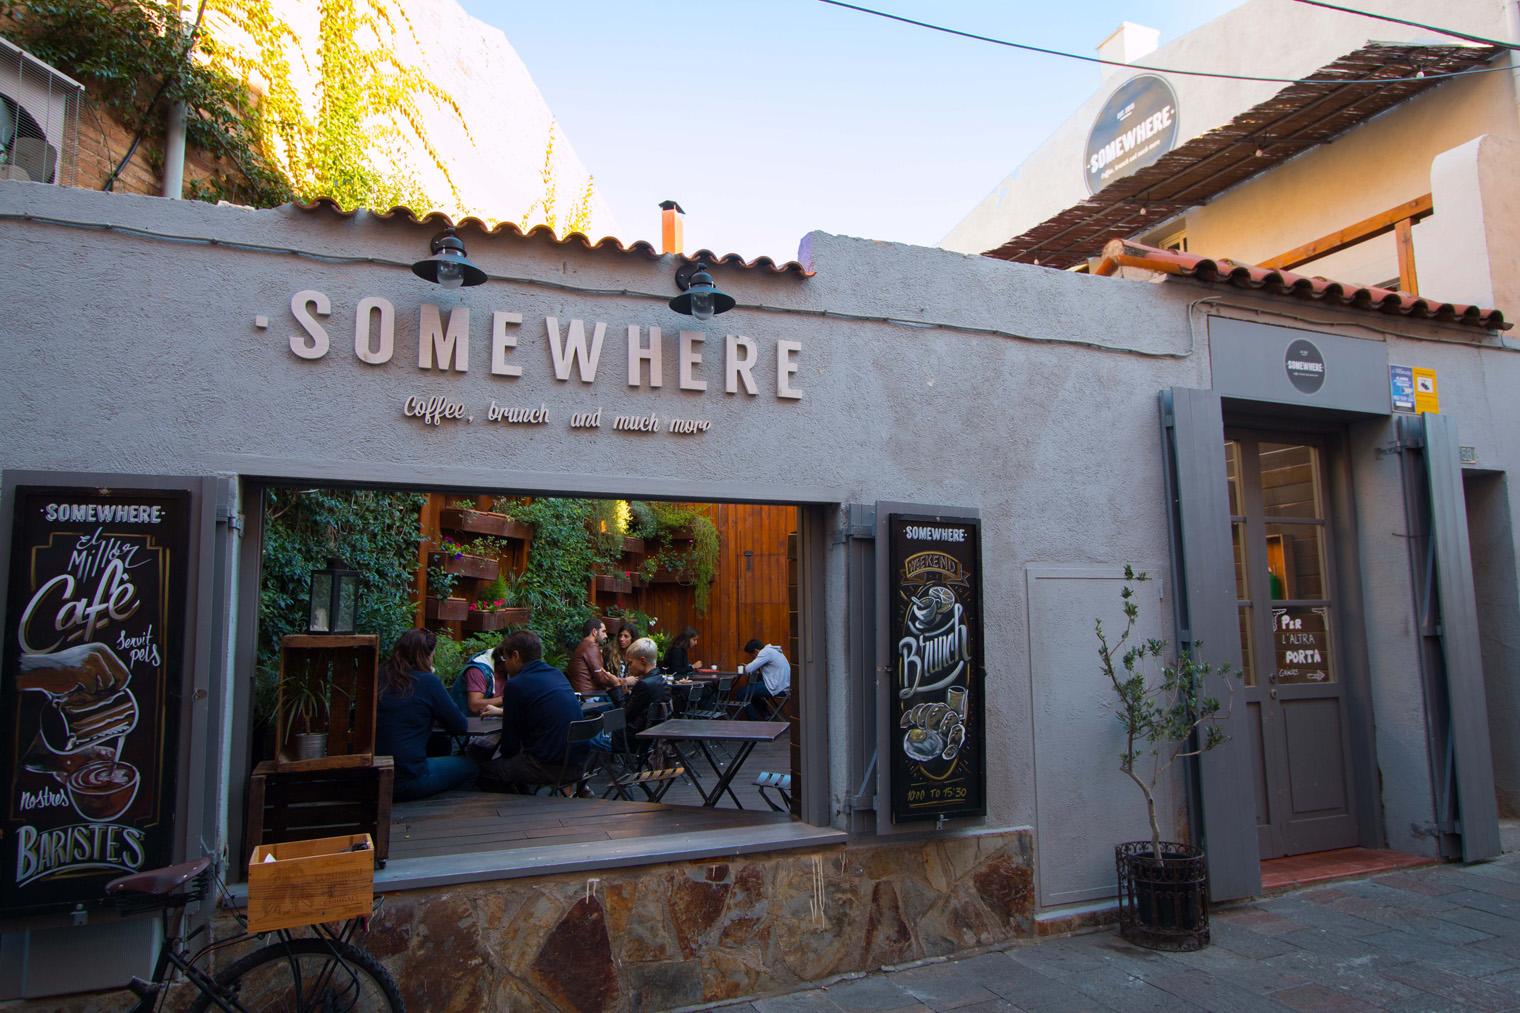 Somewhere caf brunch y mucho m s en sant cugat del - Mudanzas sant cugat del valles ...